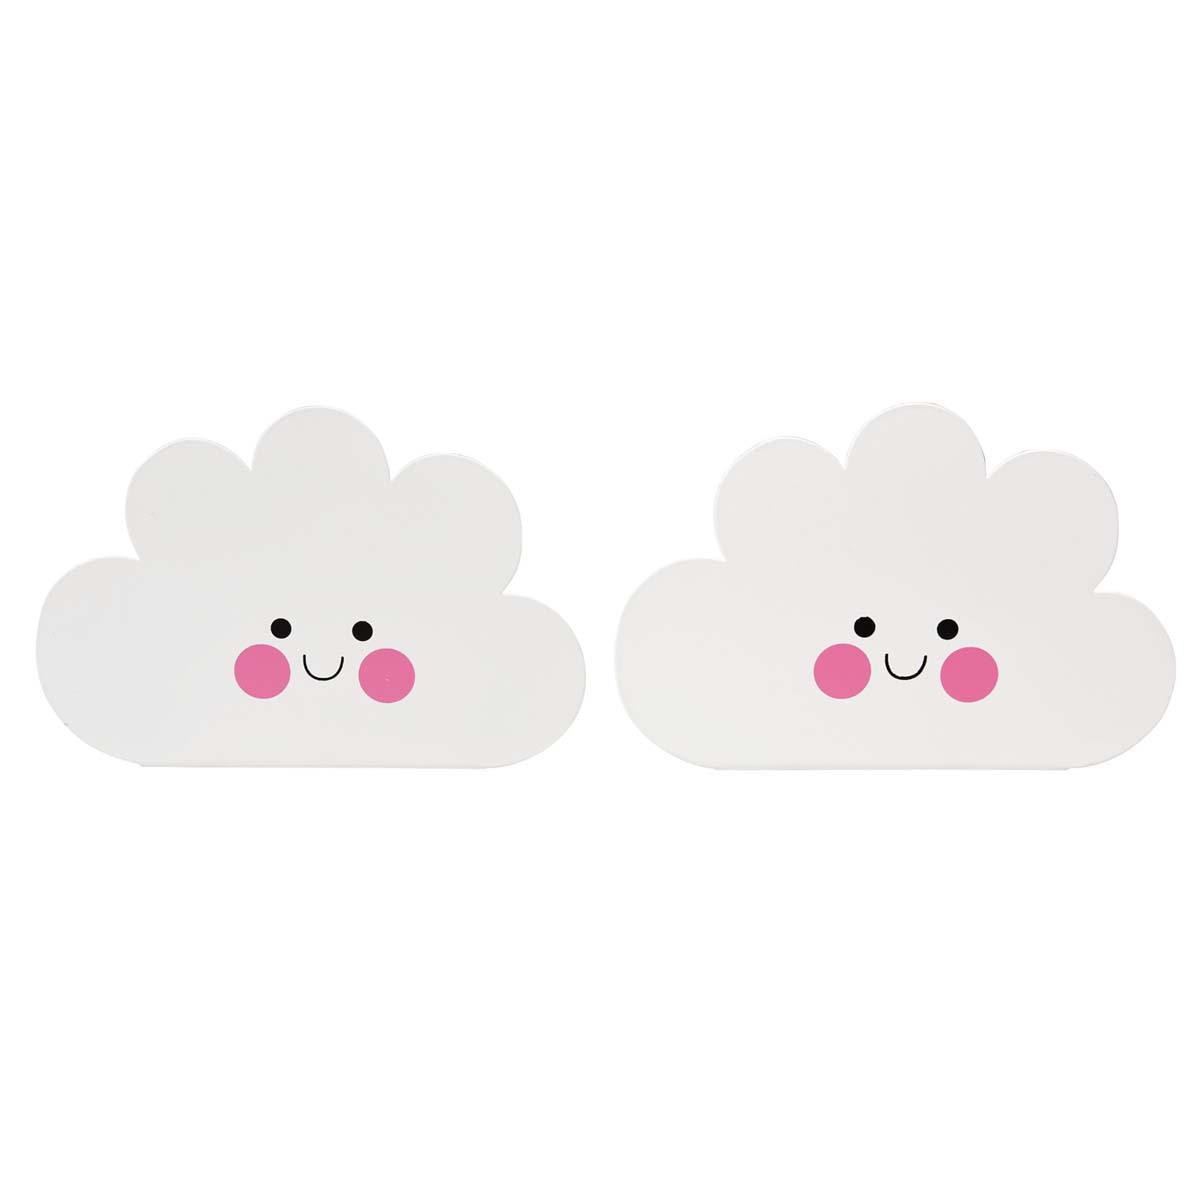 Livre & Carte Serre-Livres Happy Cloud Serre-Livres Happy Cloud